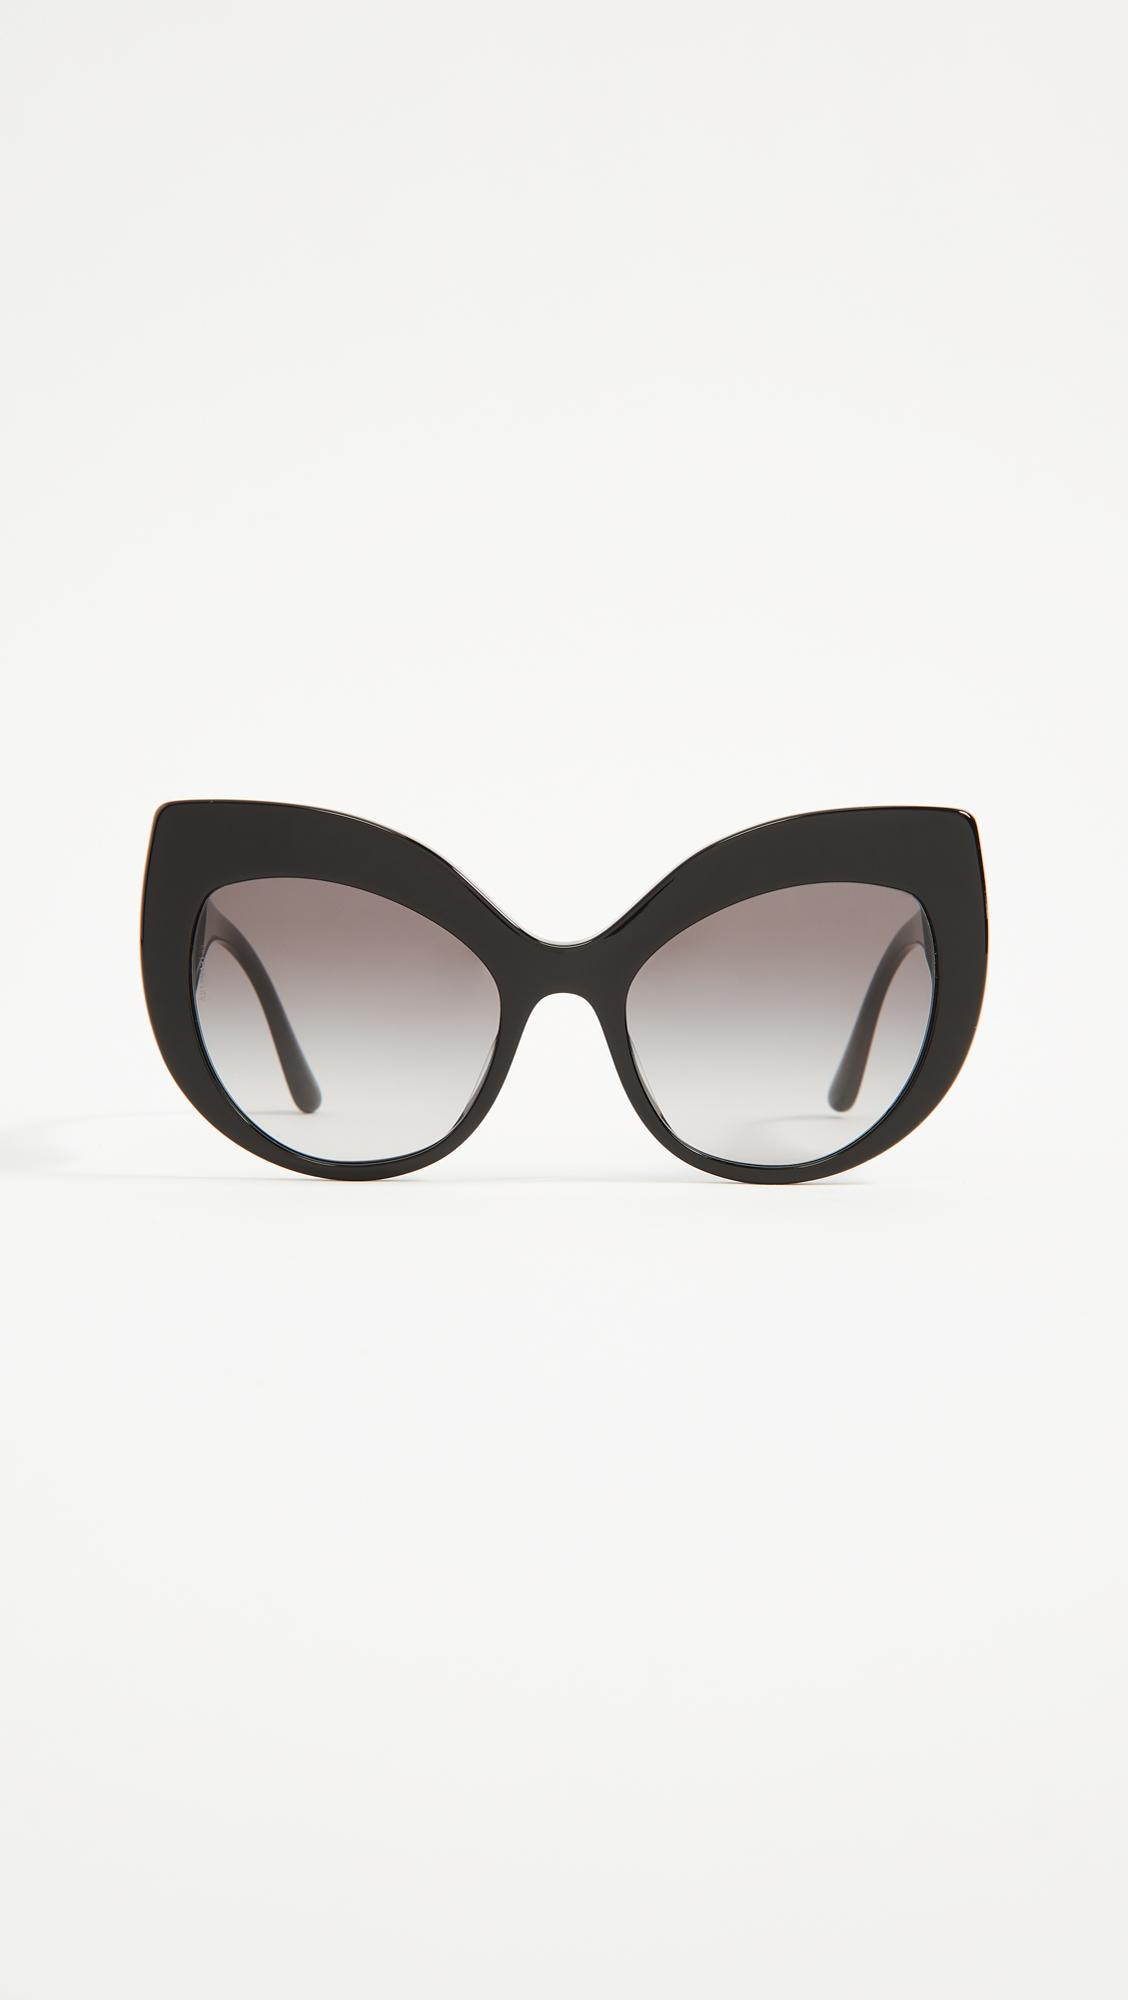 314a0ef9d27 Dolce   Gabbana Ortensia Extreme Cat Sunglasses in Black - Lyst